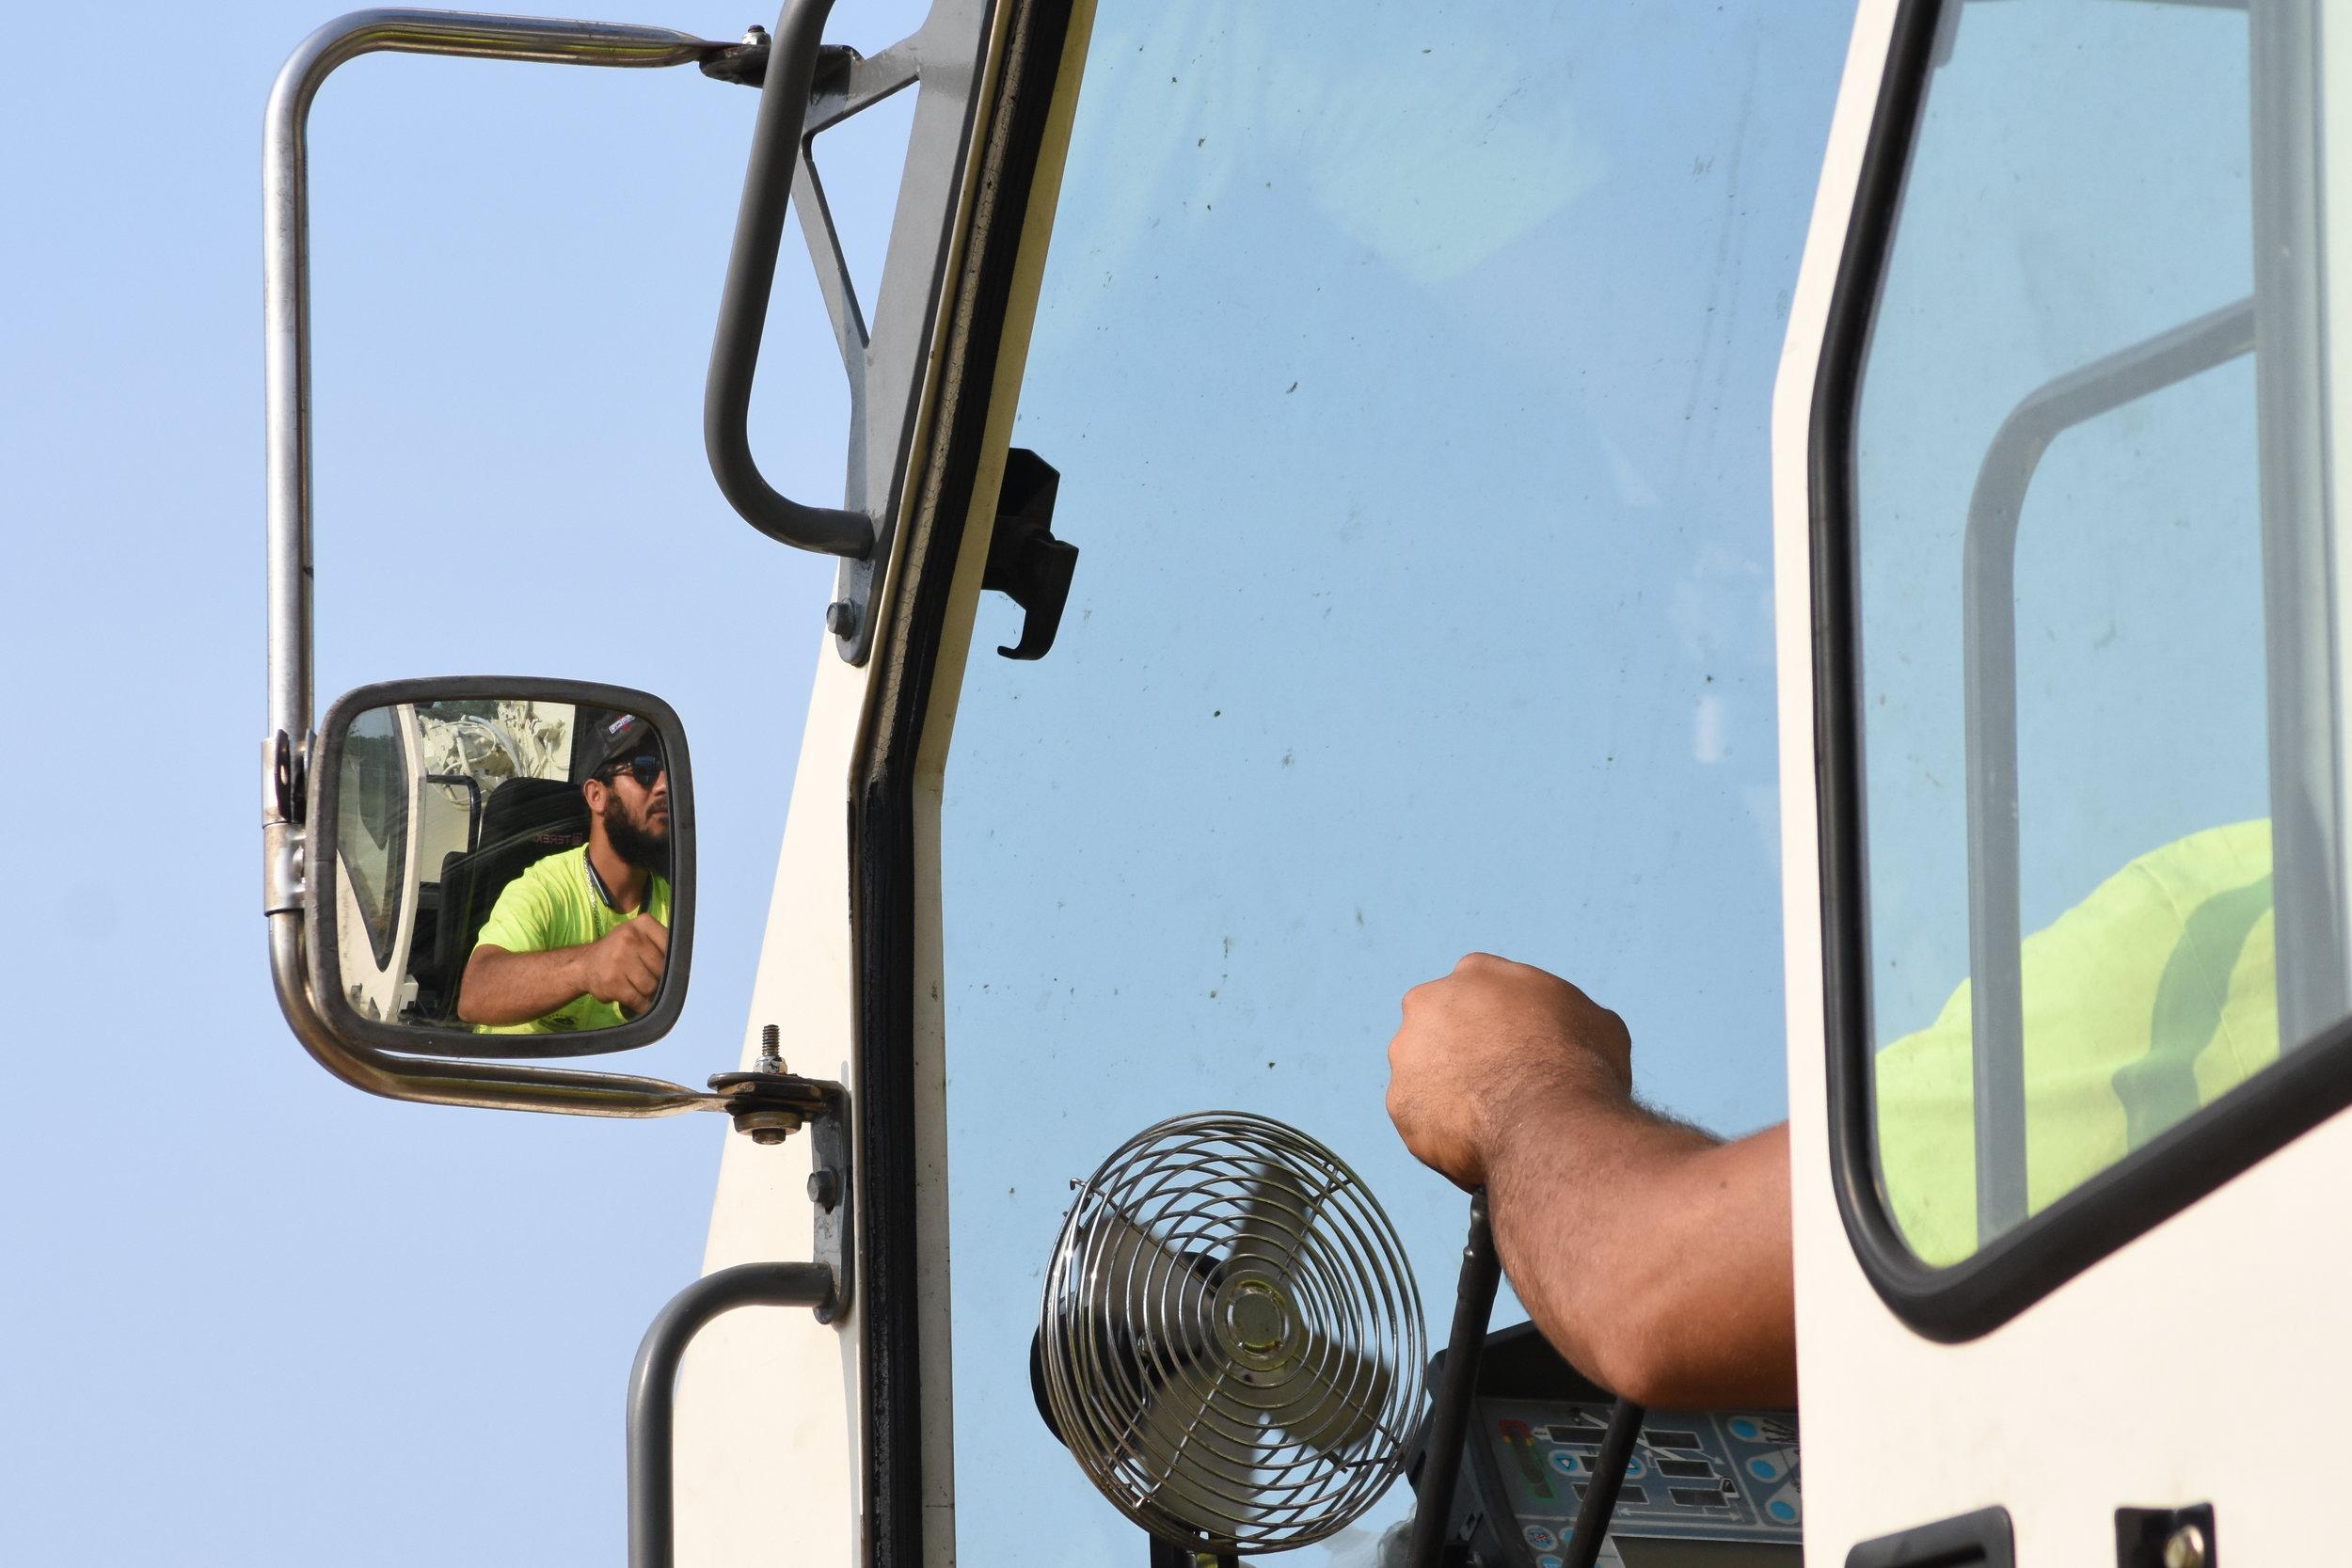 crane operator close up in mirror hands on controls focused.JPG